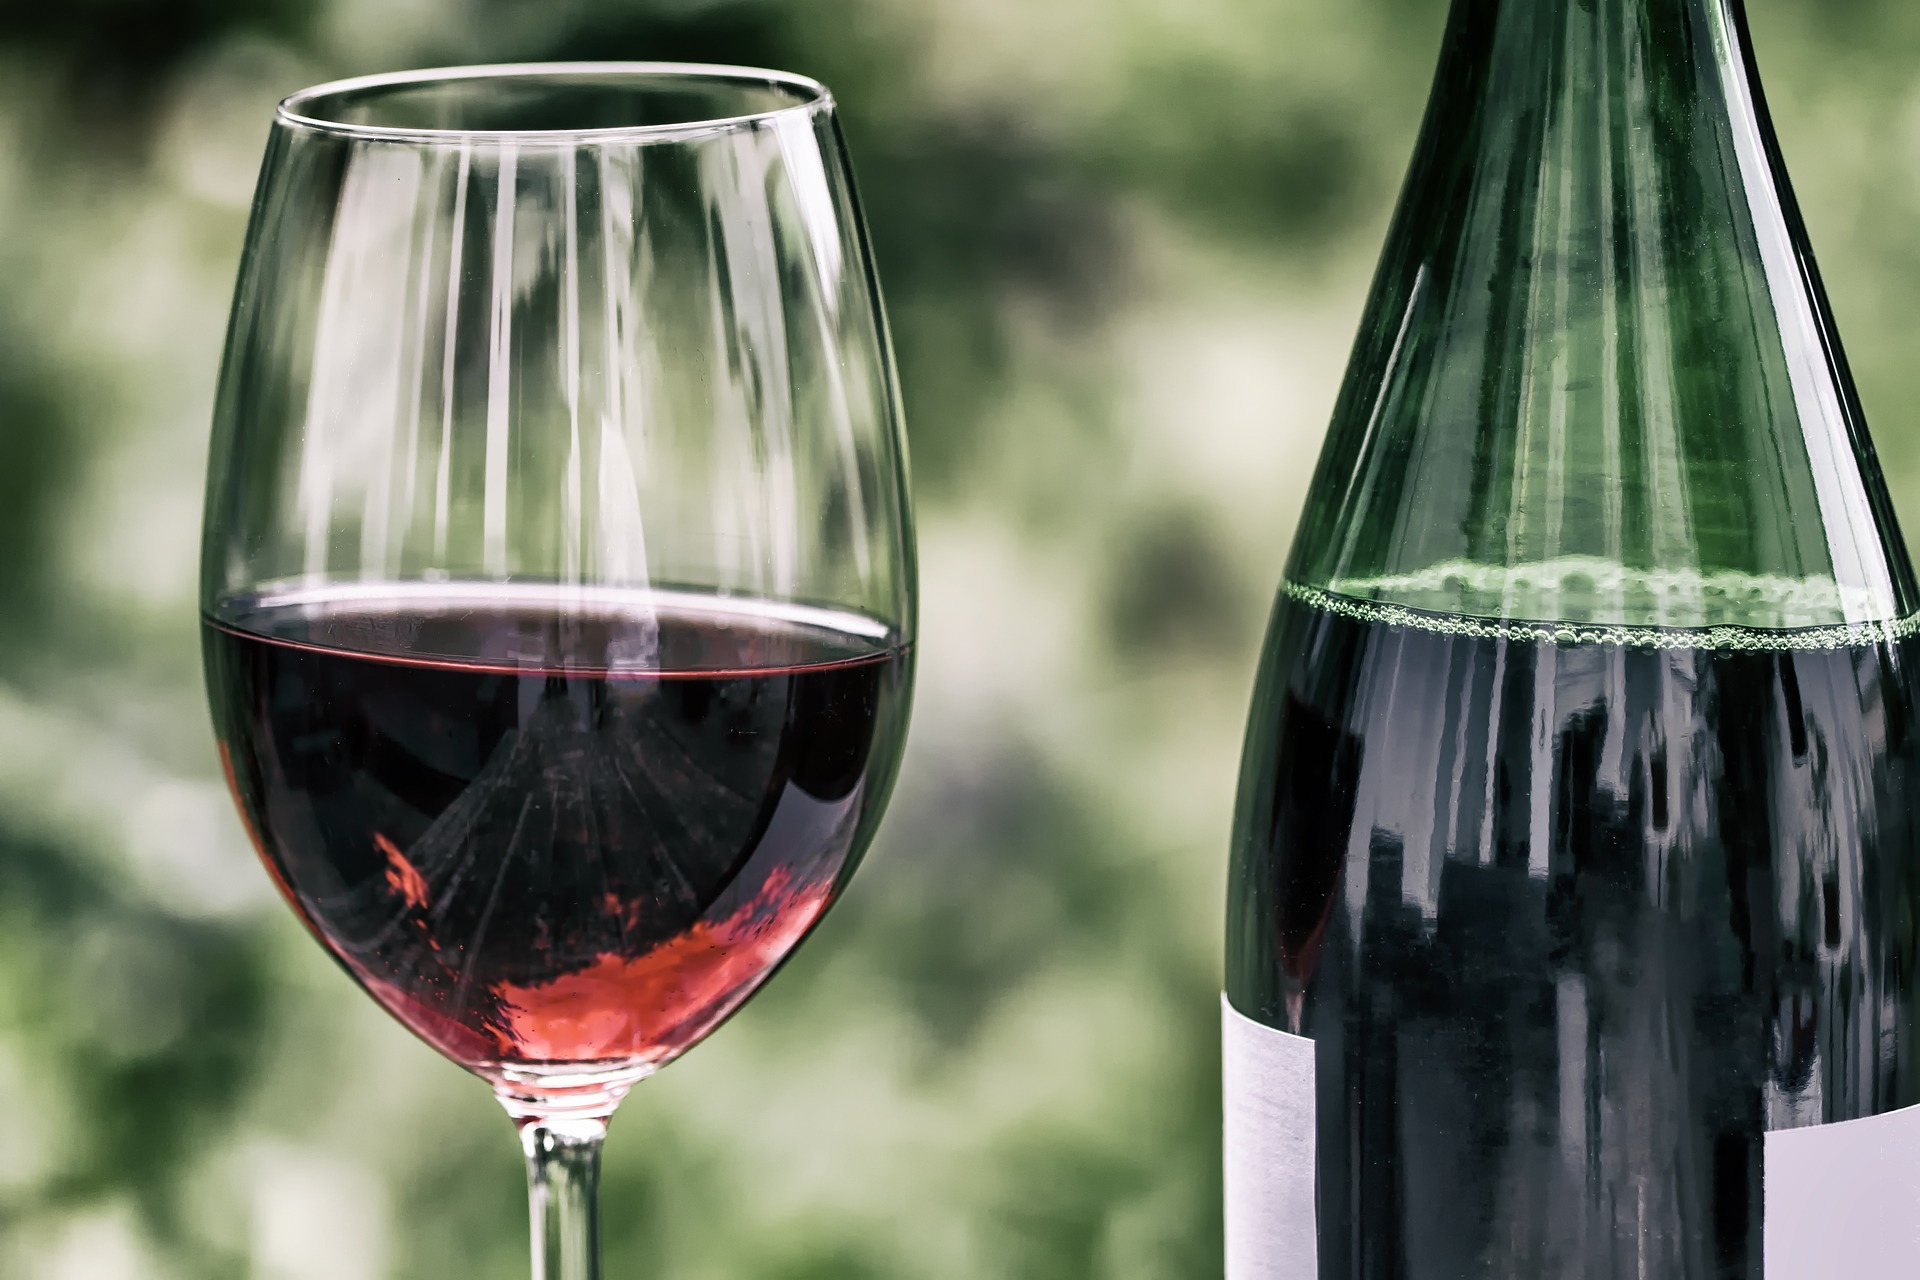 Festa del vino 2017 - Lameziatermeit